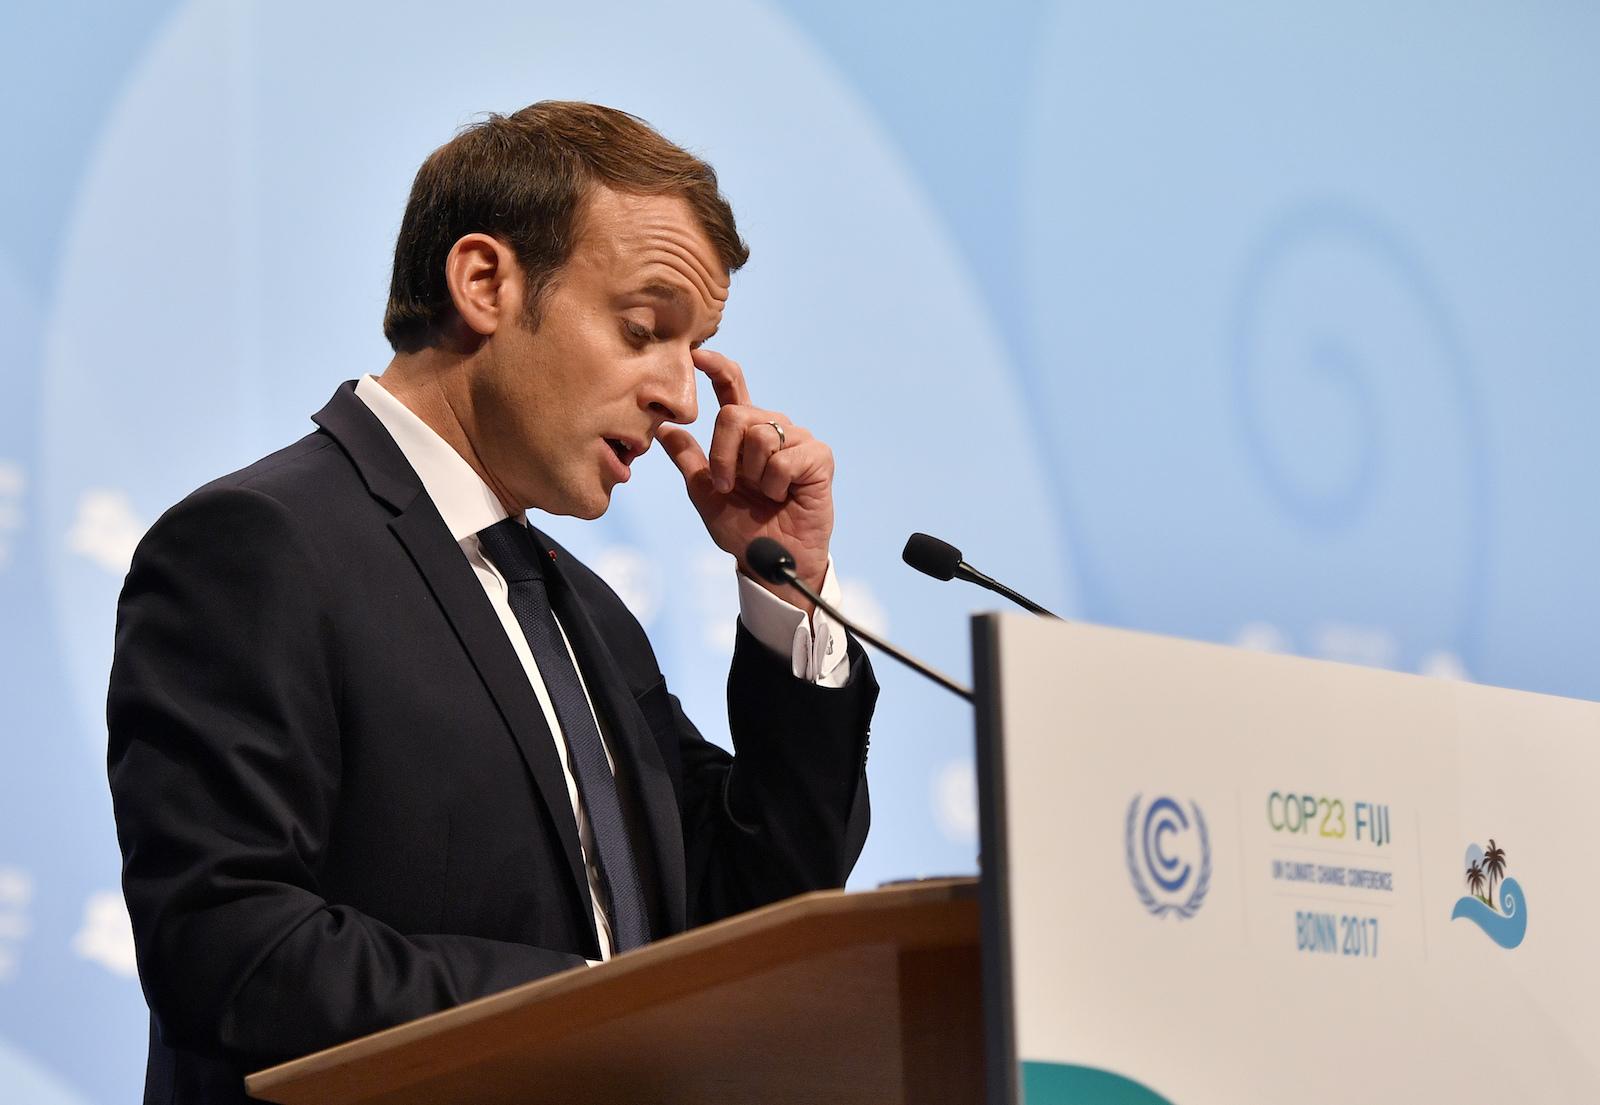 French President Emmanuel Macron spoke at the COP23 meeting in Bonn, Germany